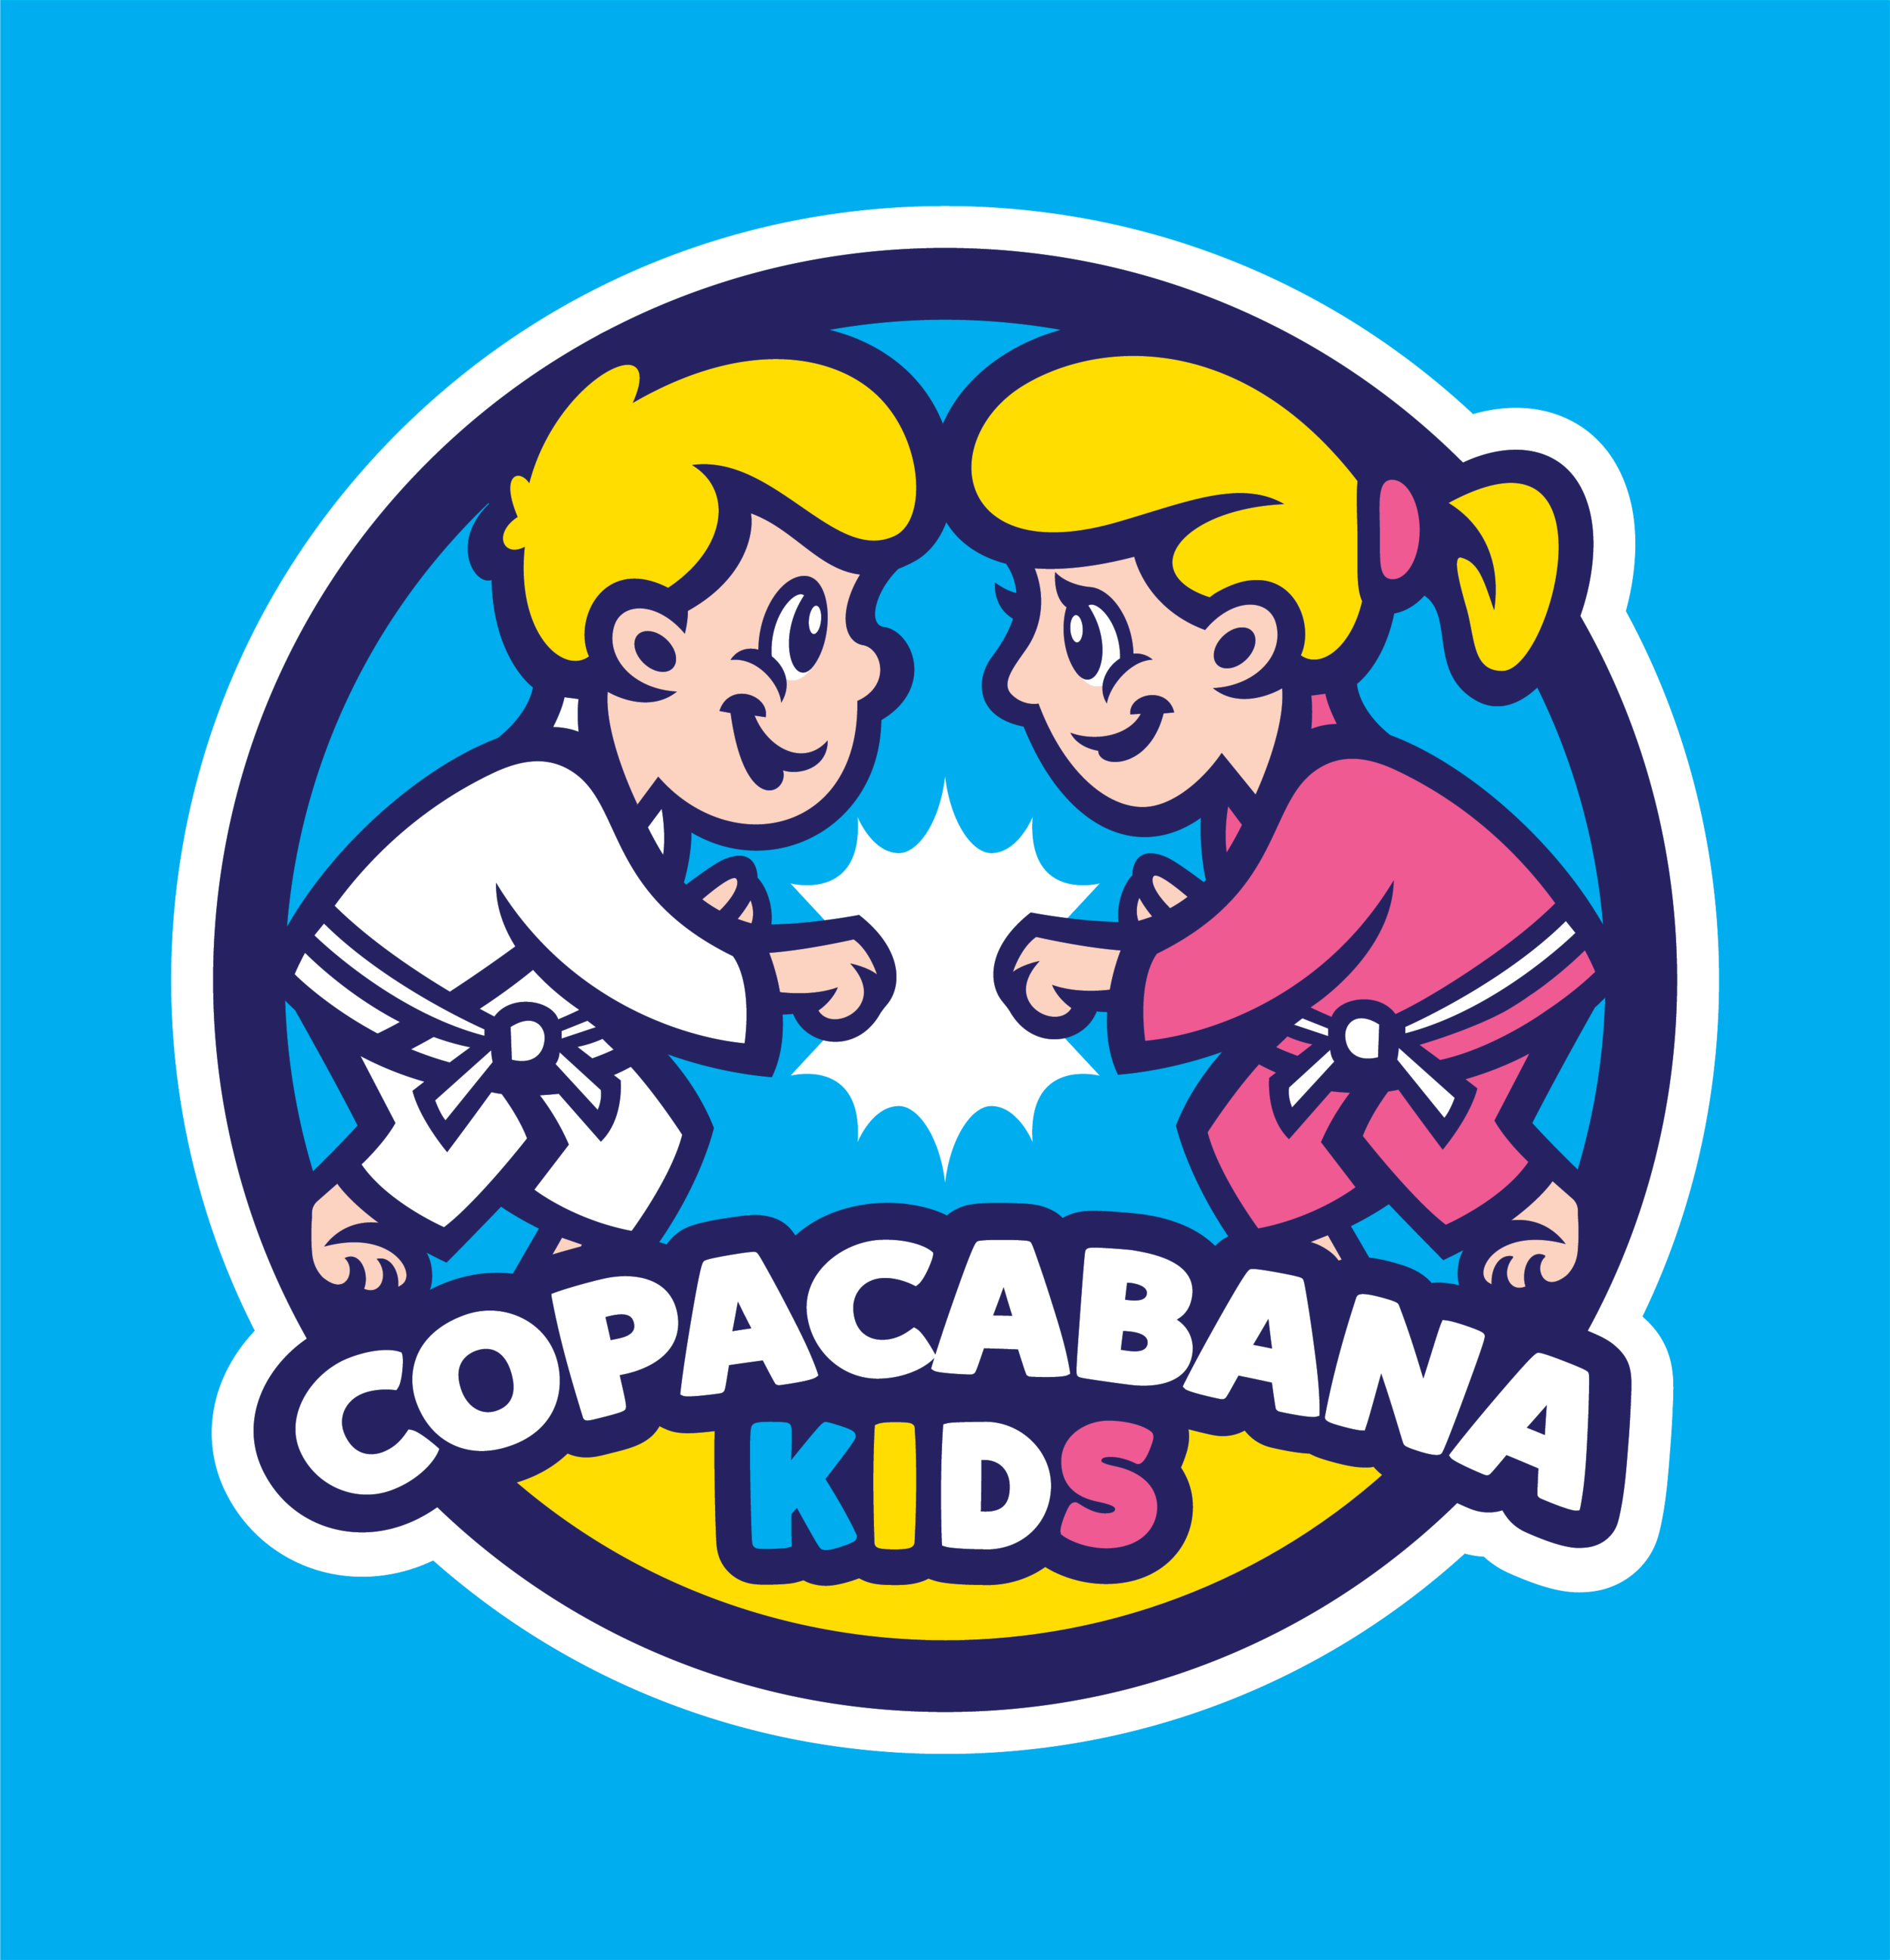 copacabana_kids_FINAL-02.png